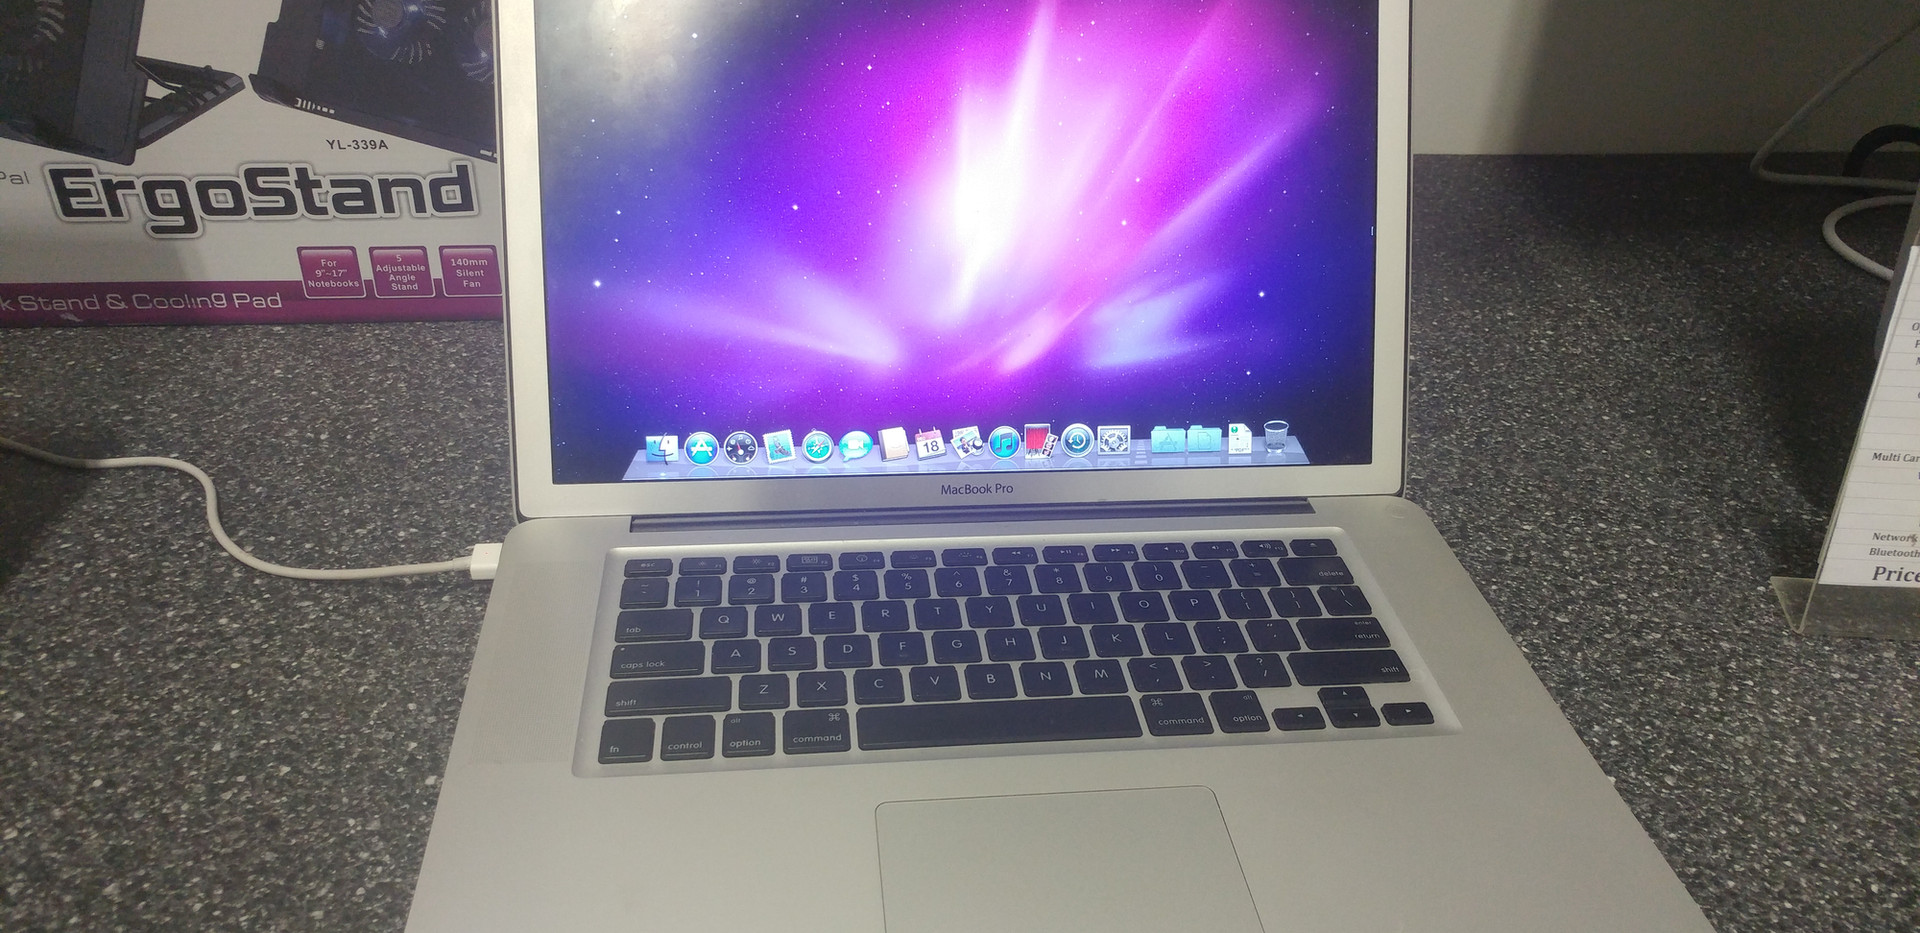 "MacBook Pro 15"" (Mid-2009)"